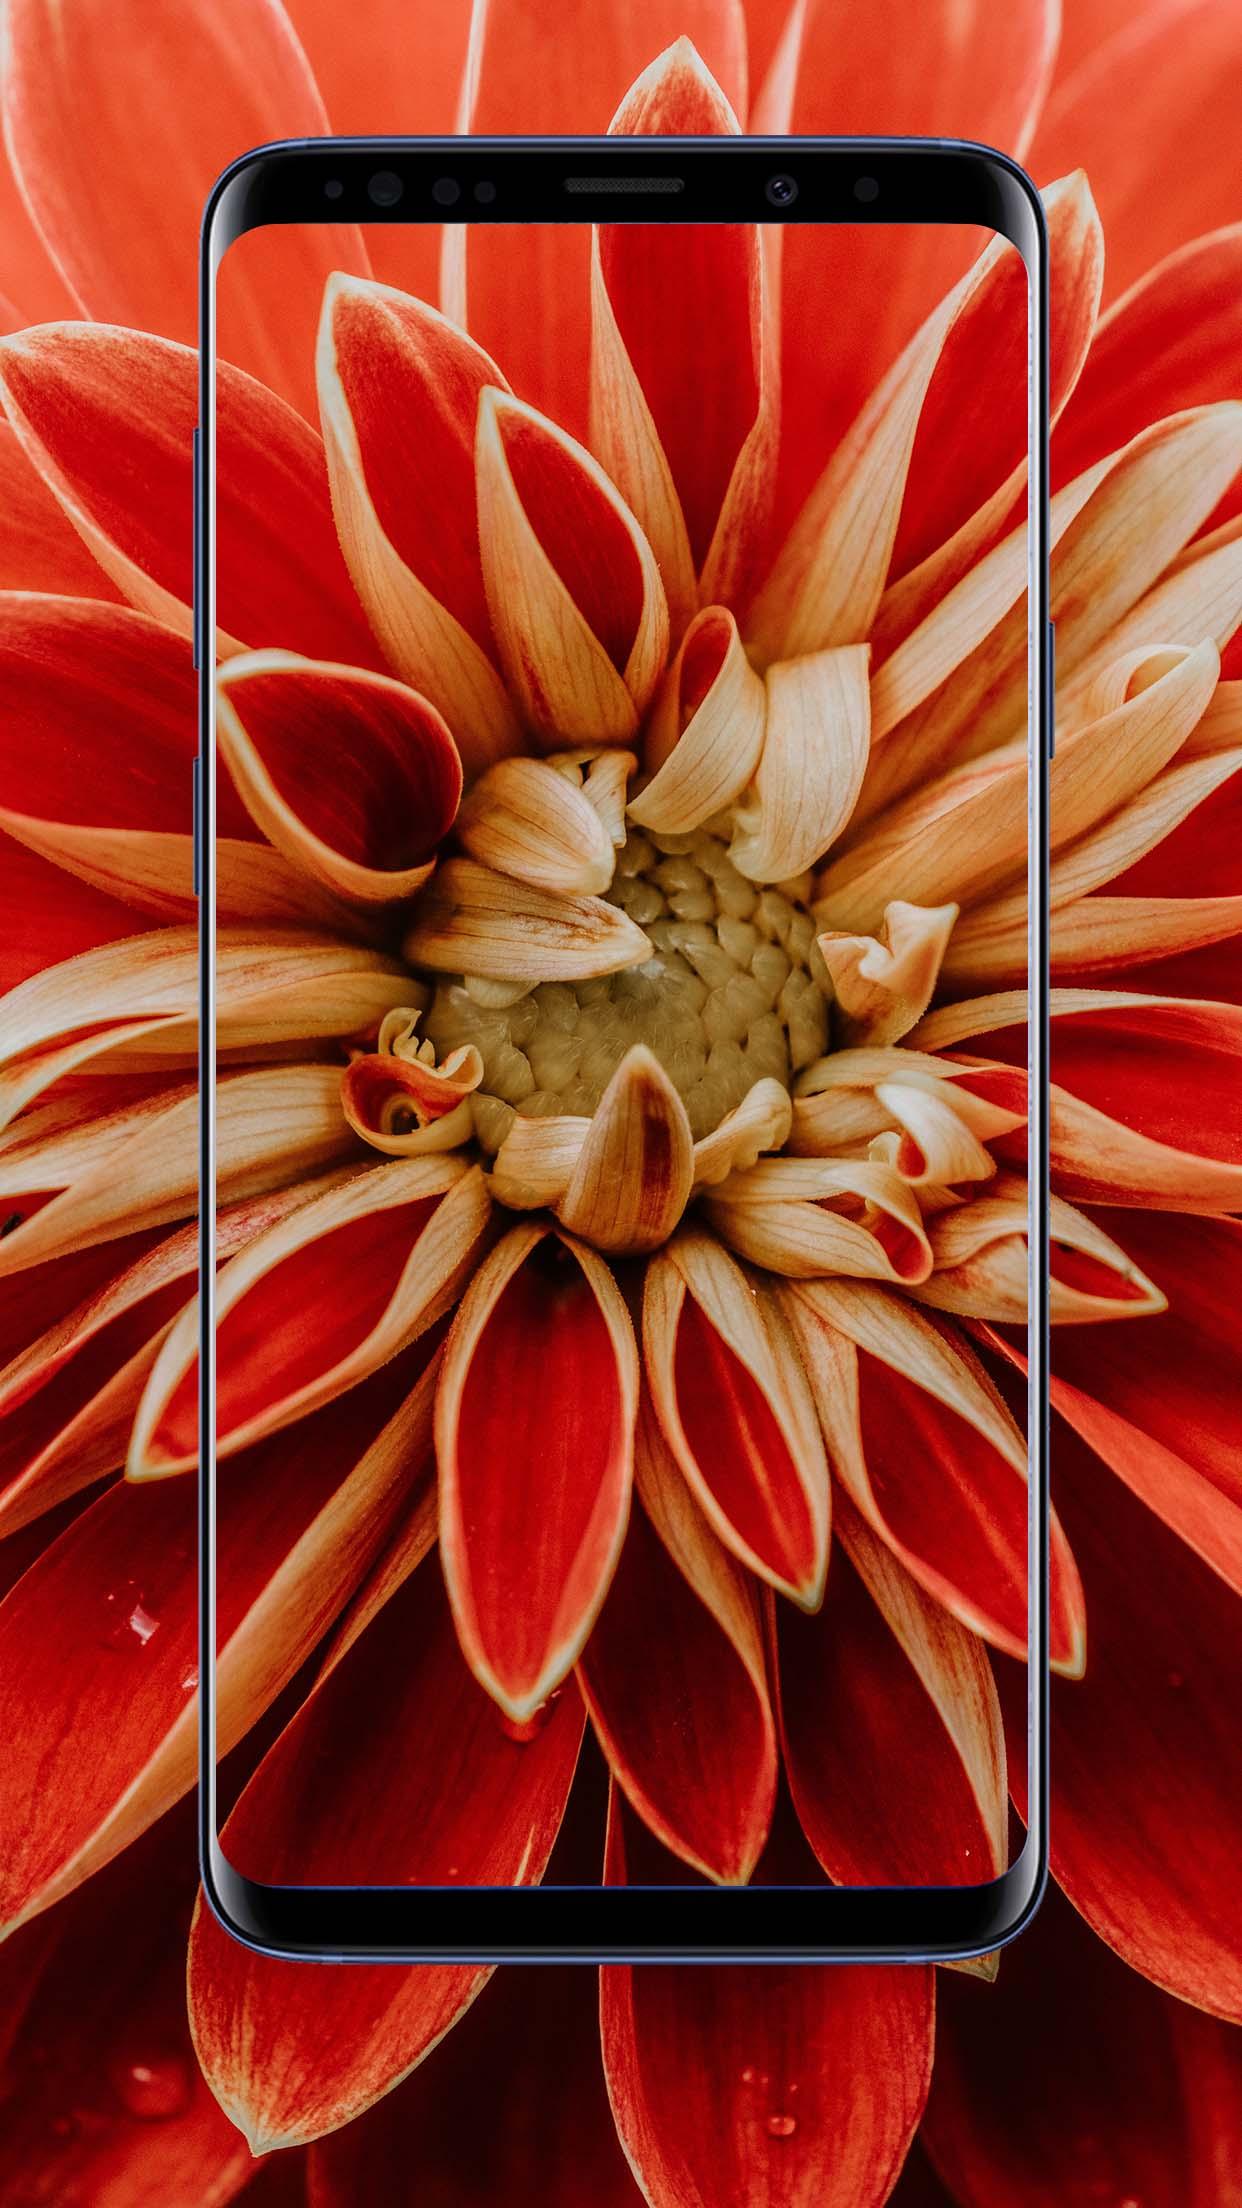 Dahlias Flower Wallpapers